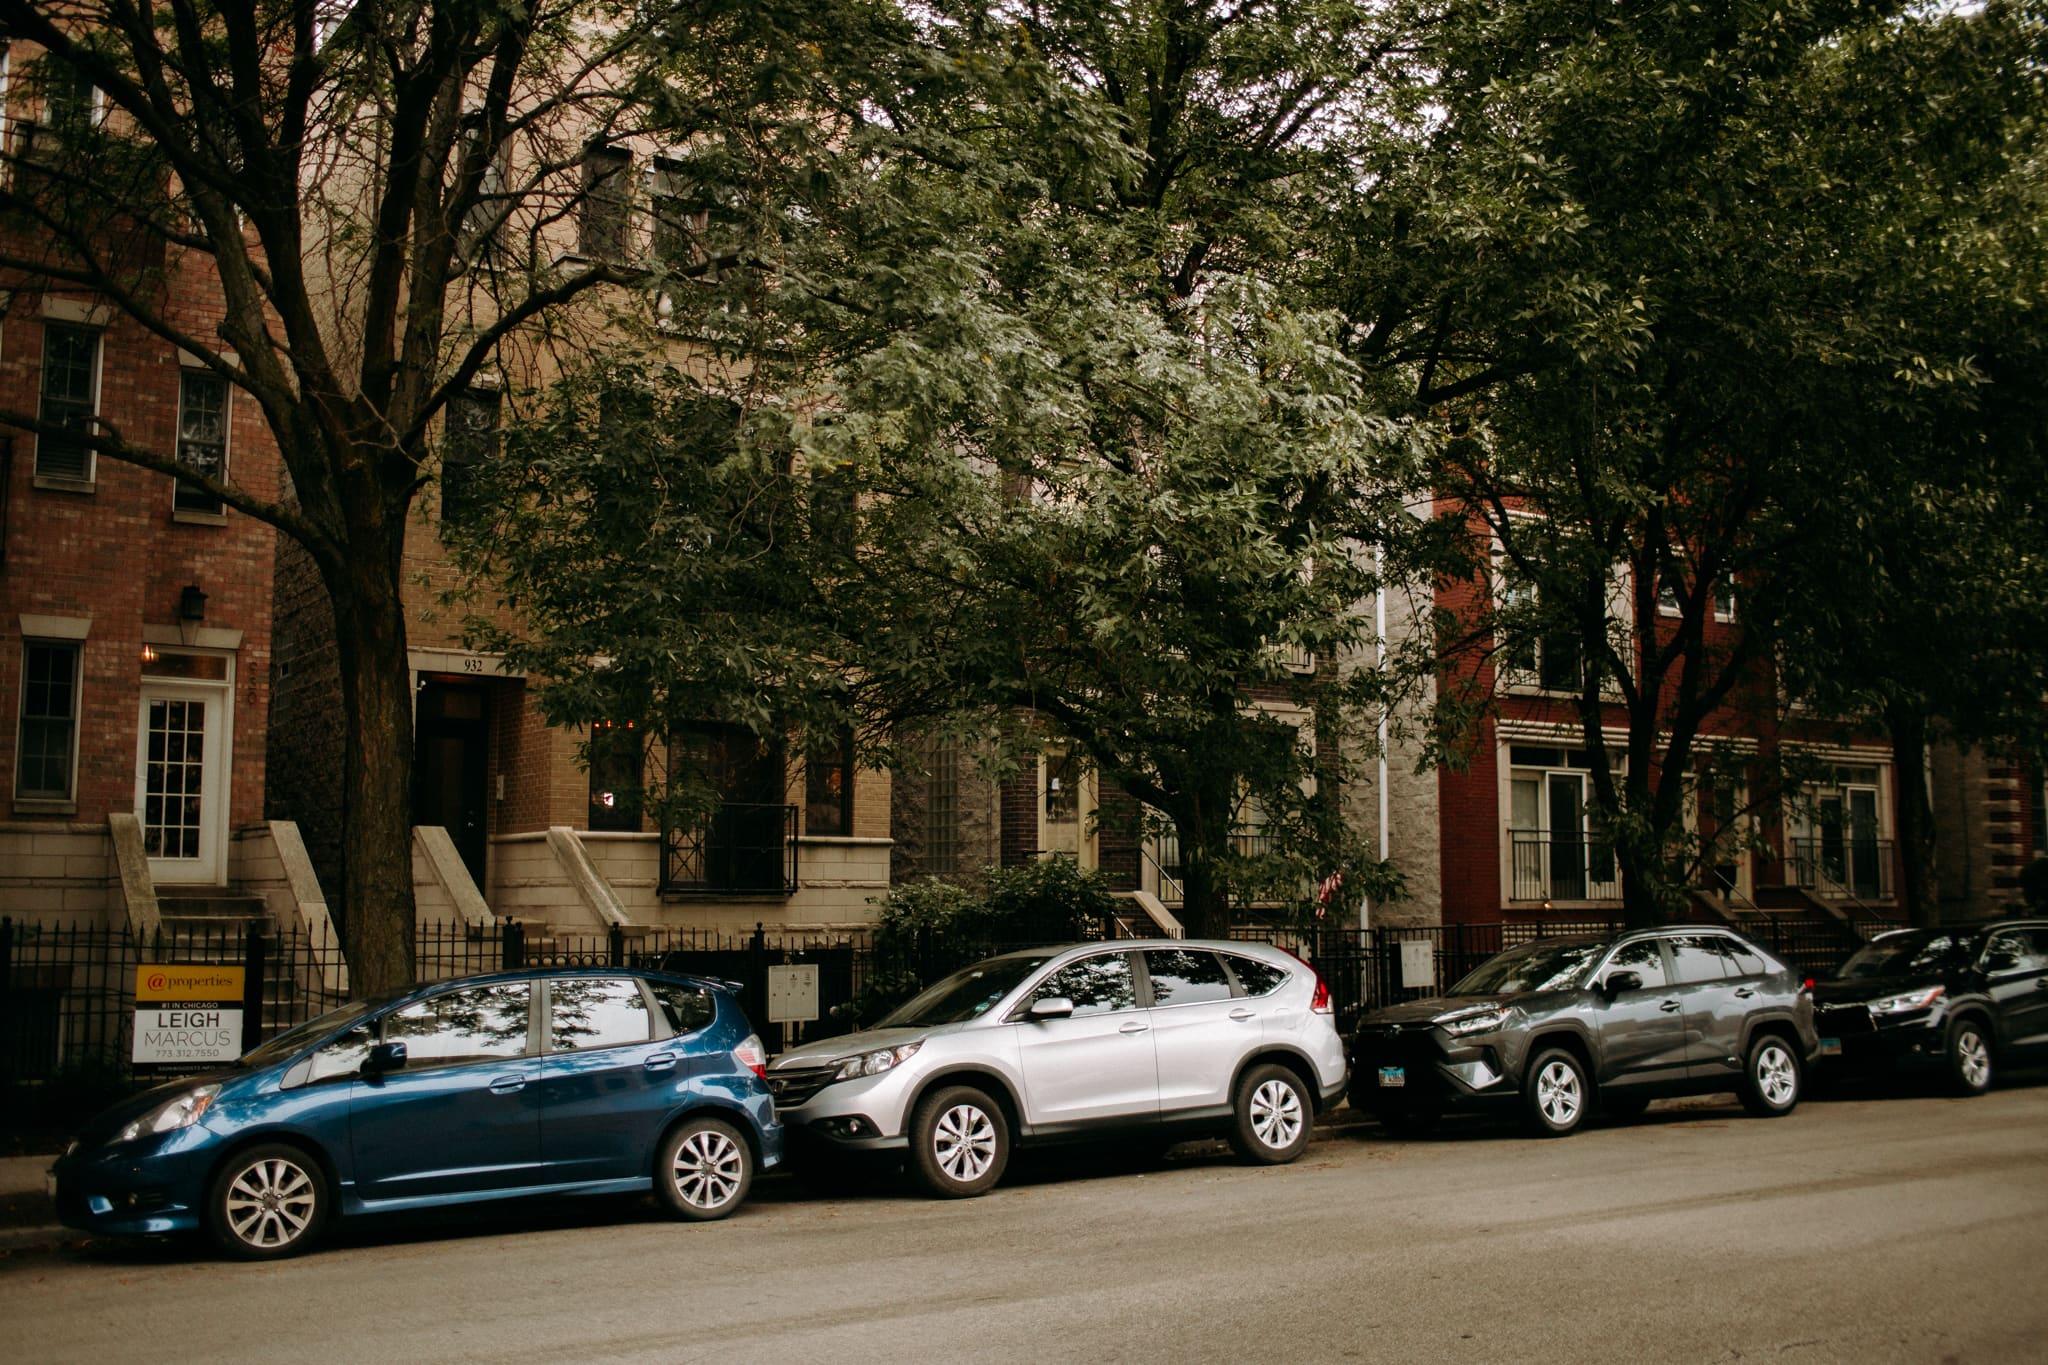 cars on a chicago street in a neighbourhood